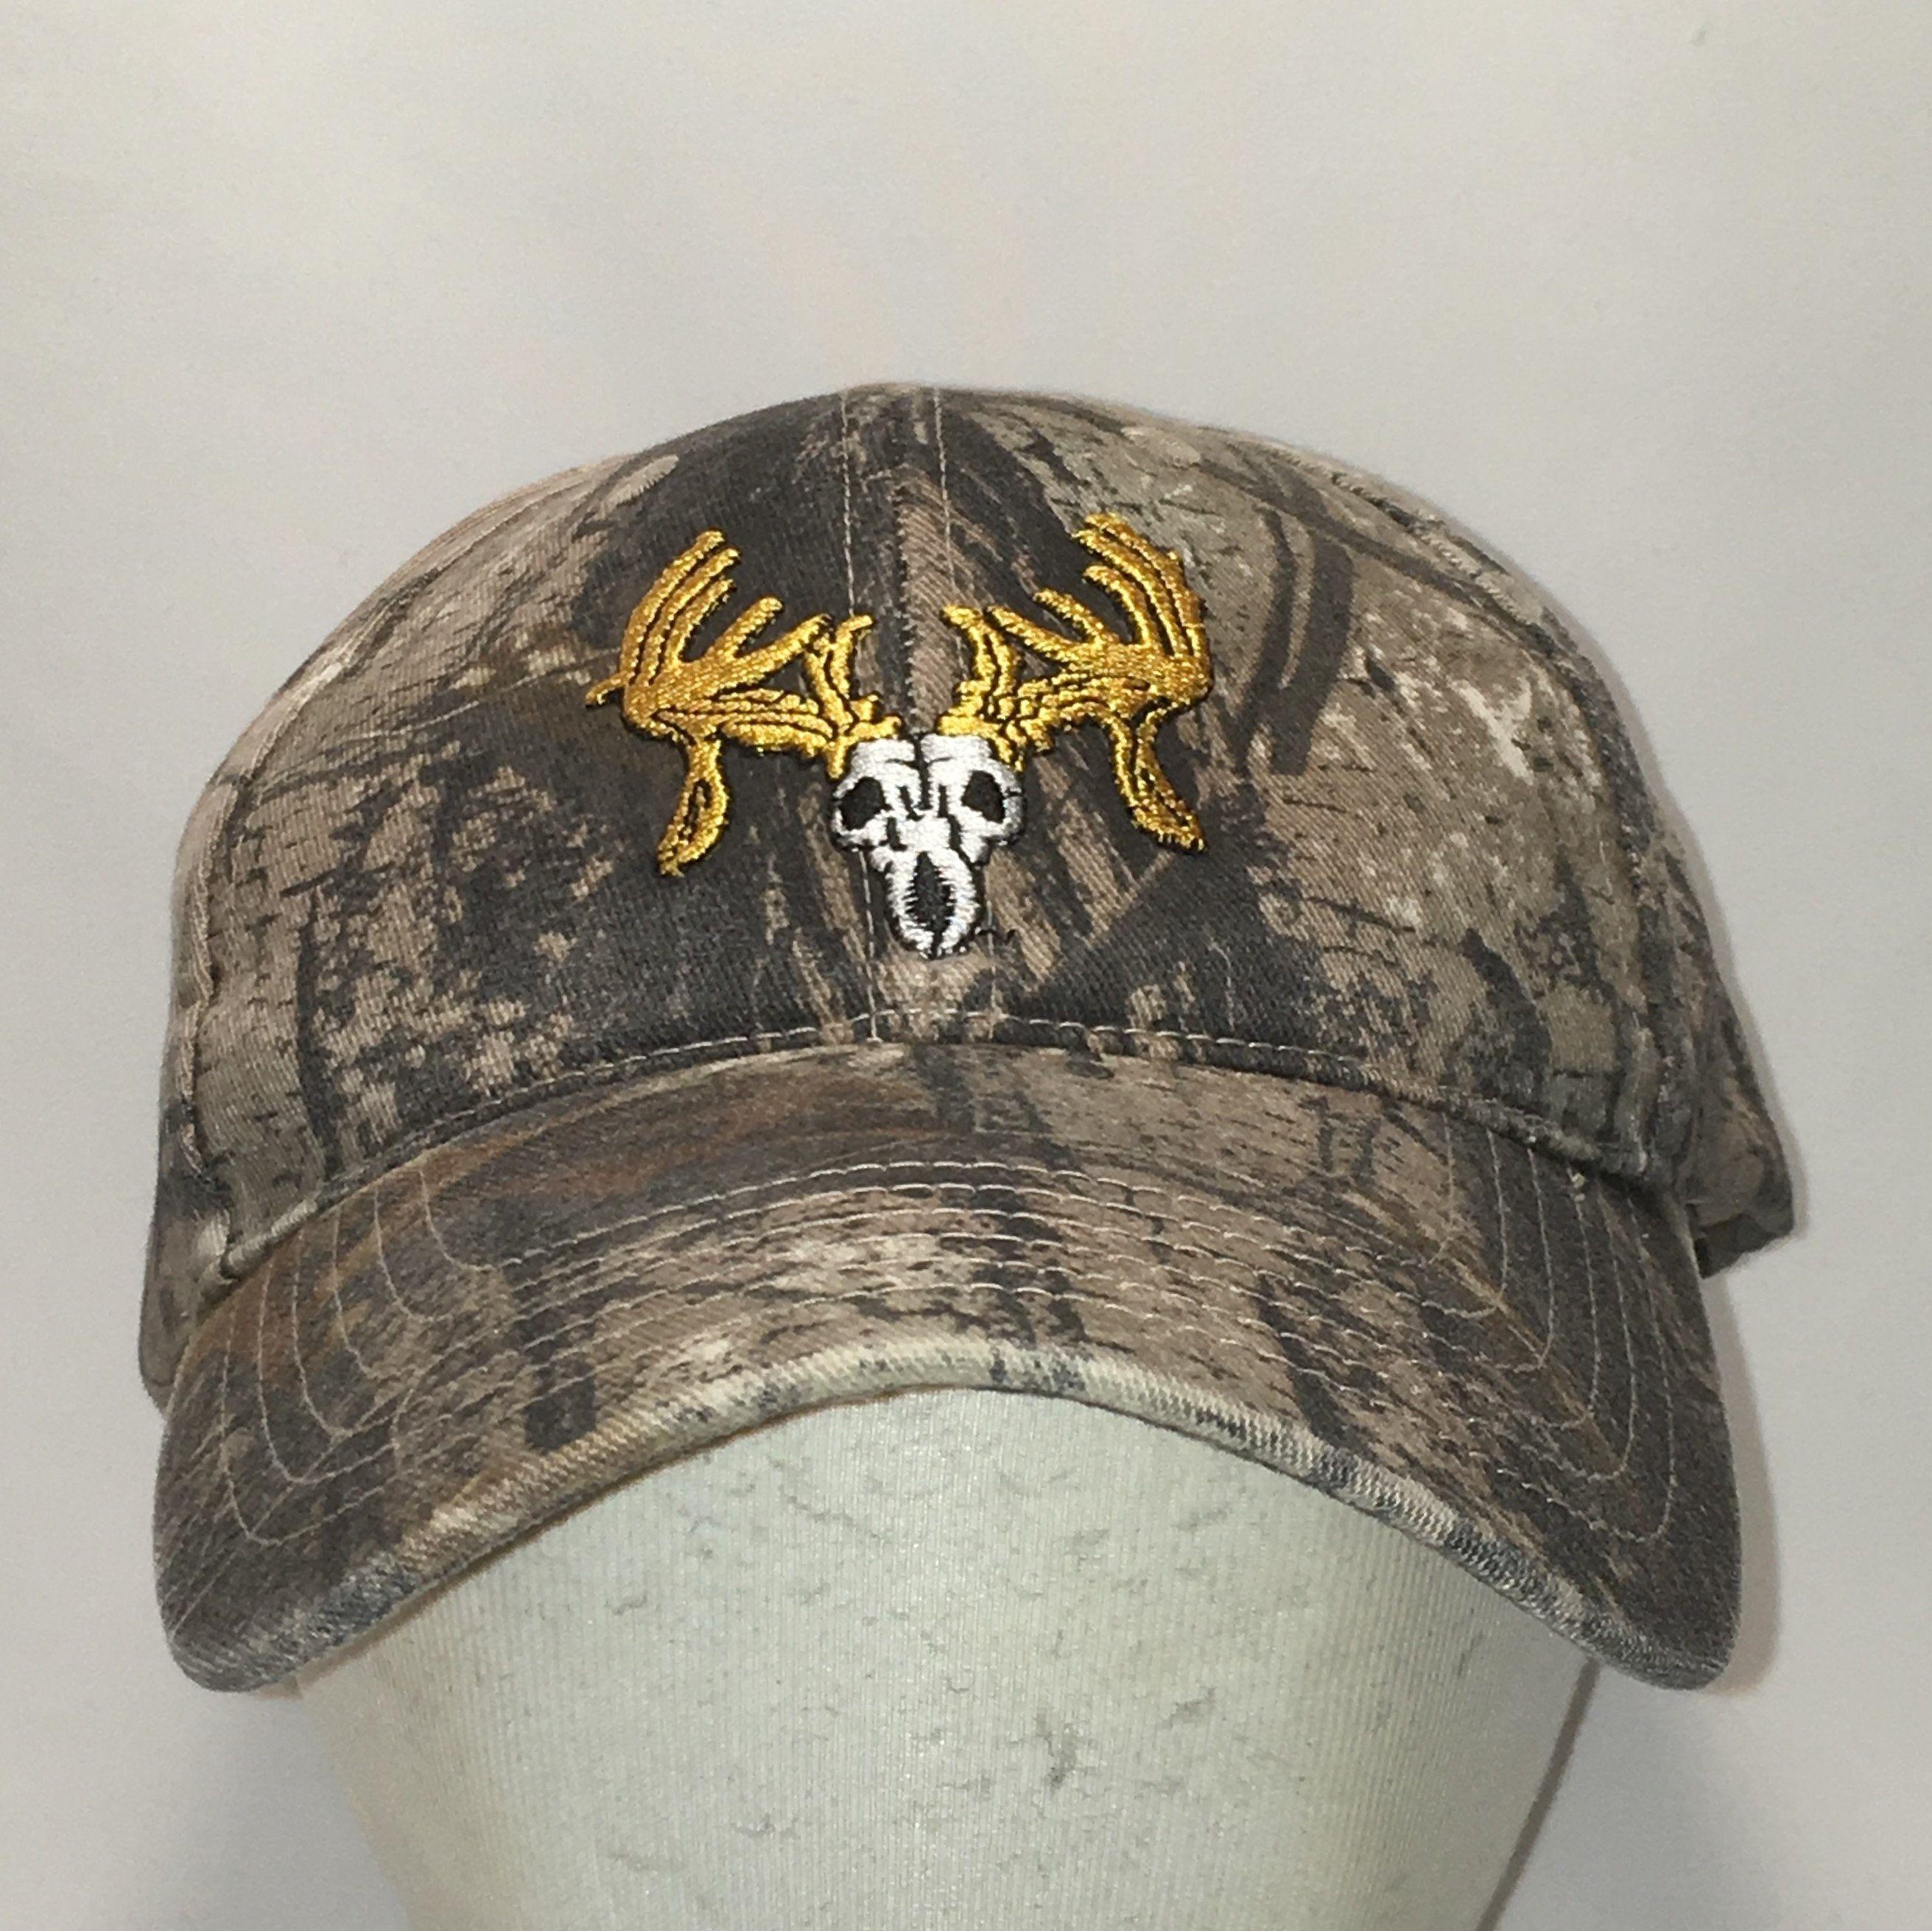 447df8a3 Vintage Texas Trophy Hunters Camo Hat Brown Beige Gold Baseball Cap ...